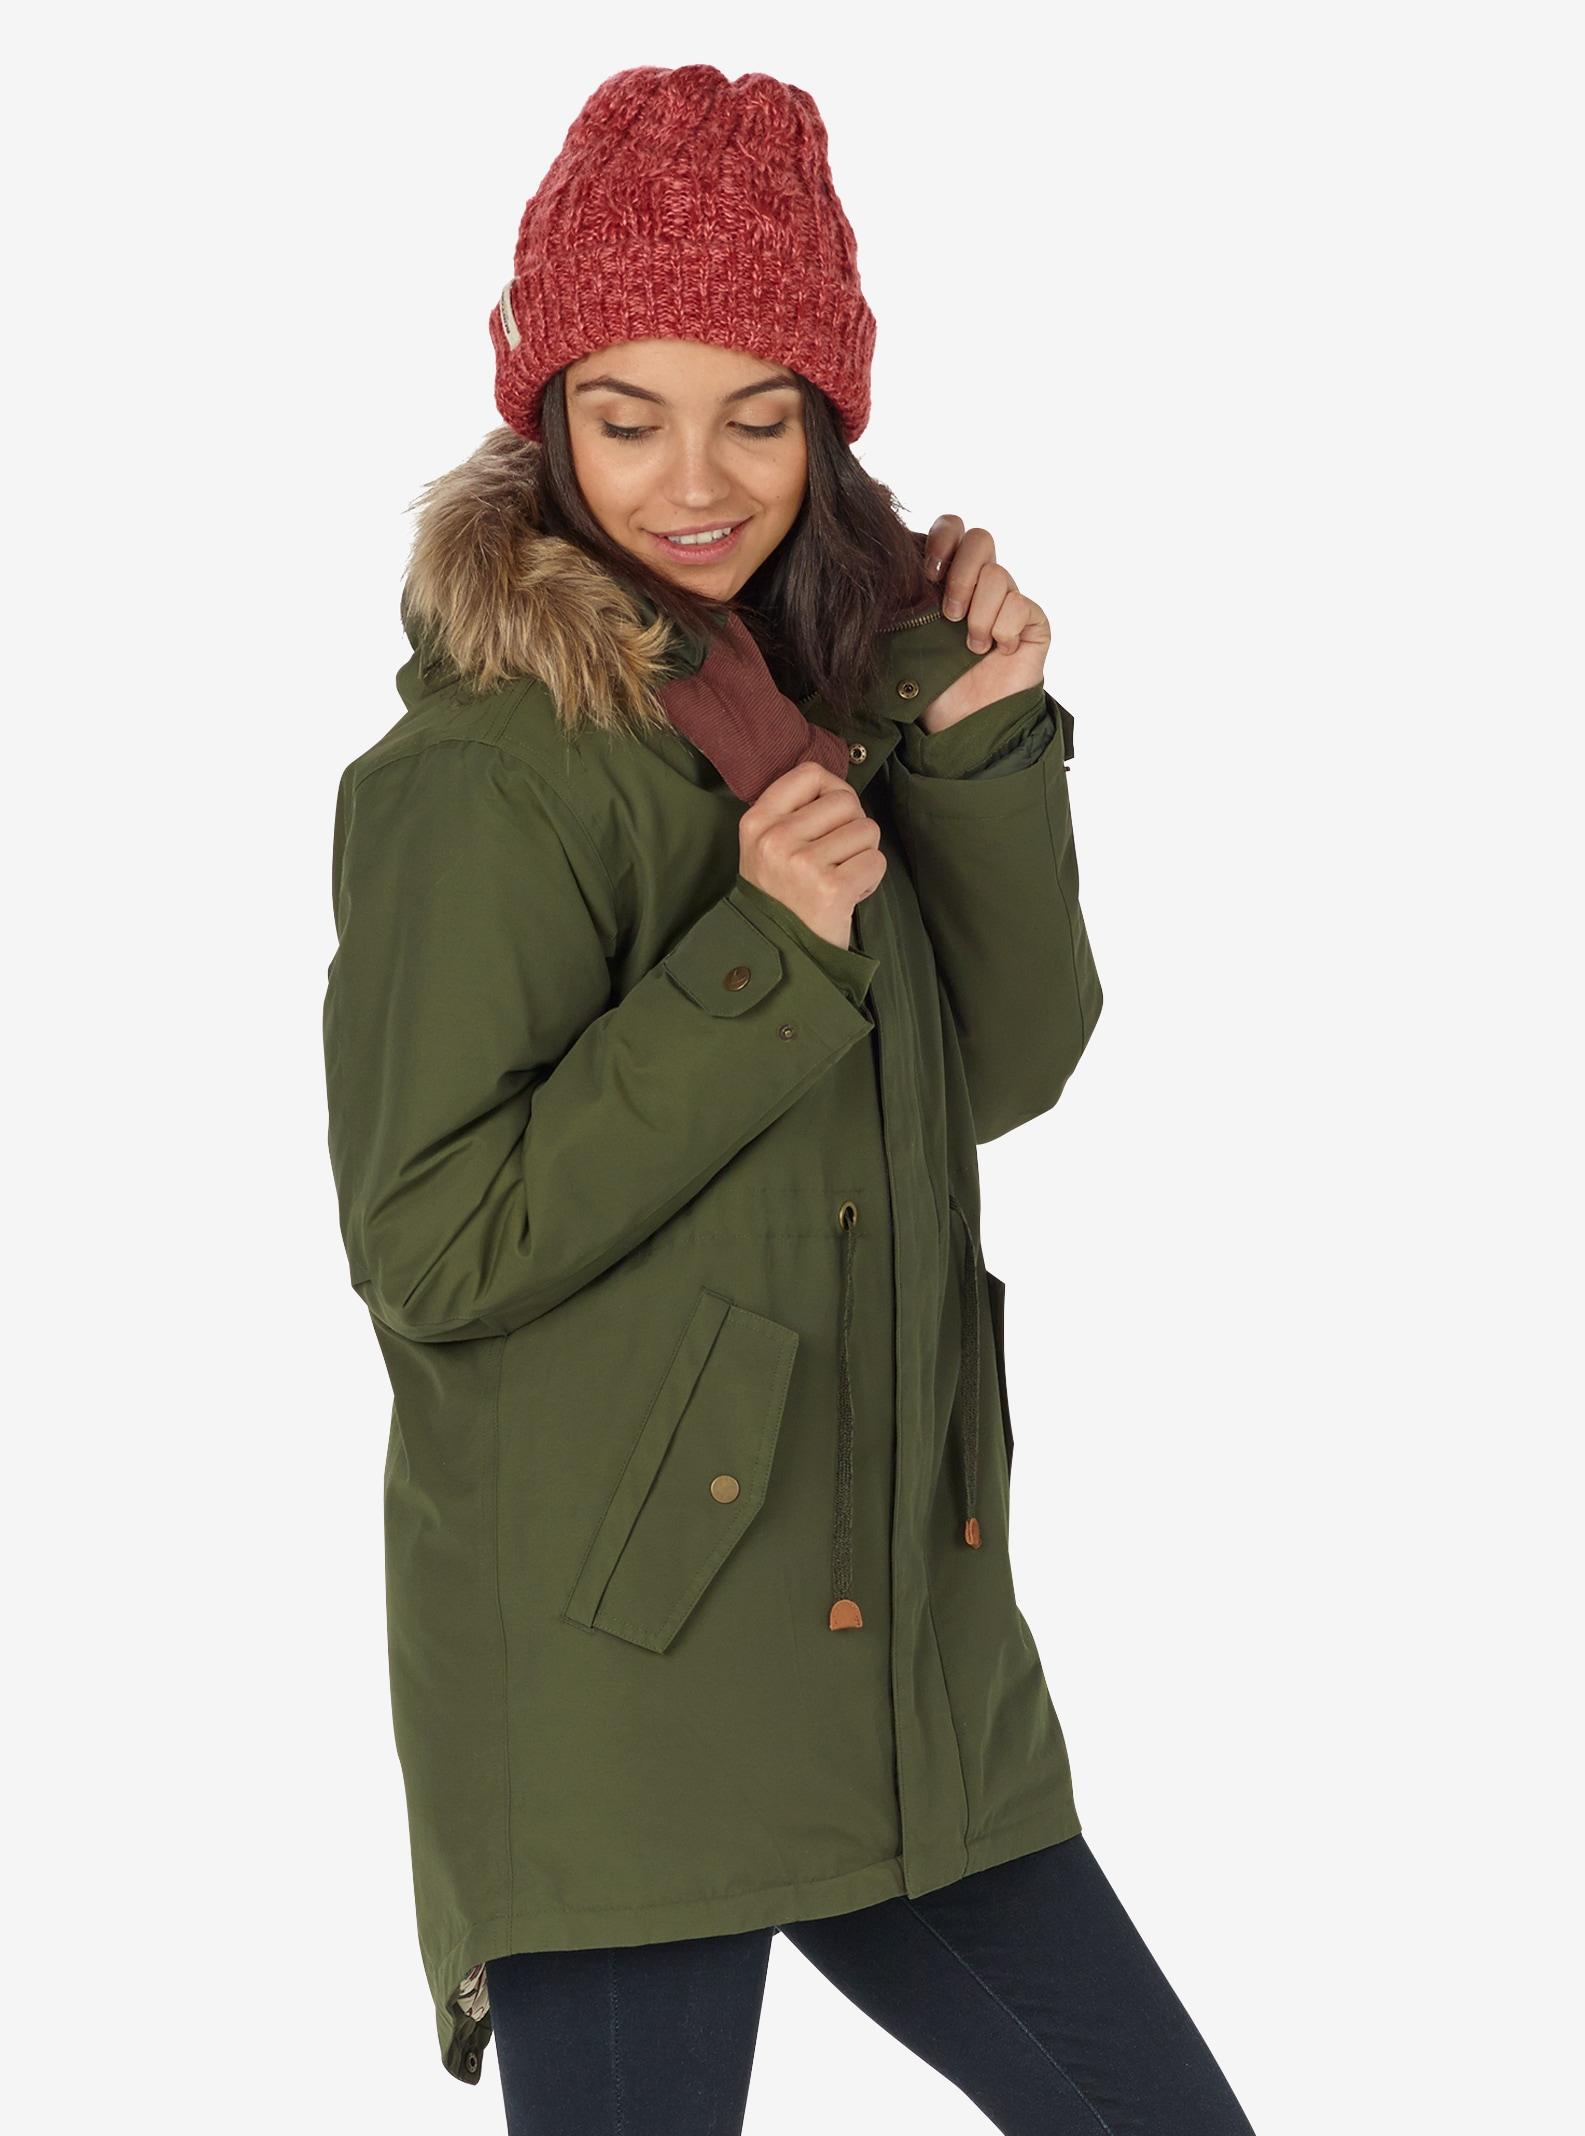 Women's Burton Saxton Parka Jacket | Burton Snowboards Fall 2017